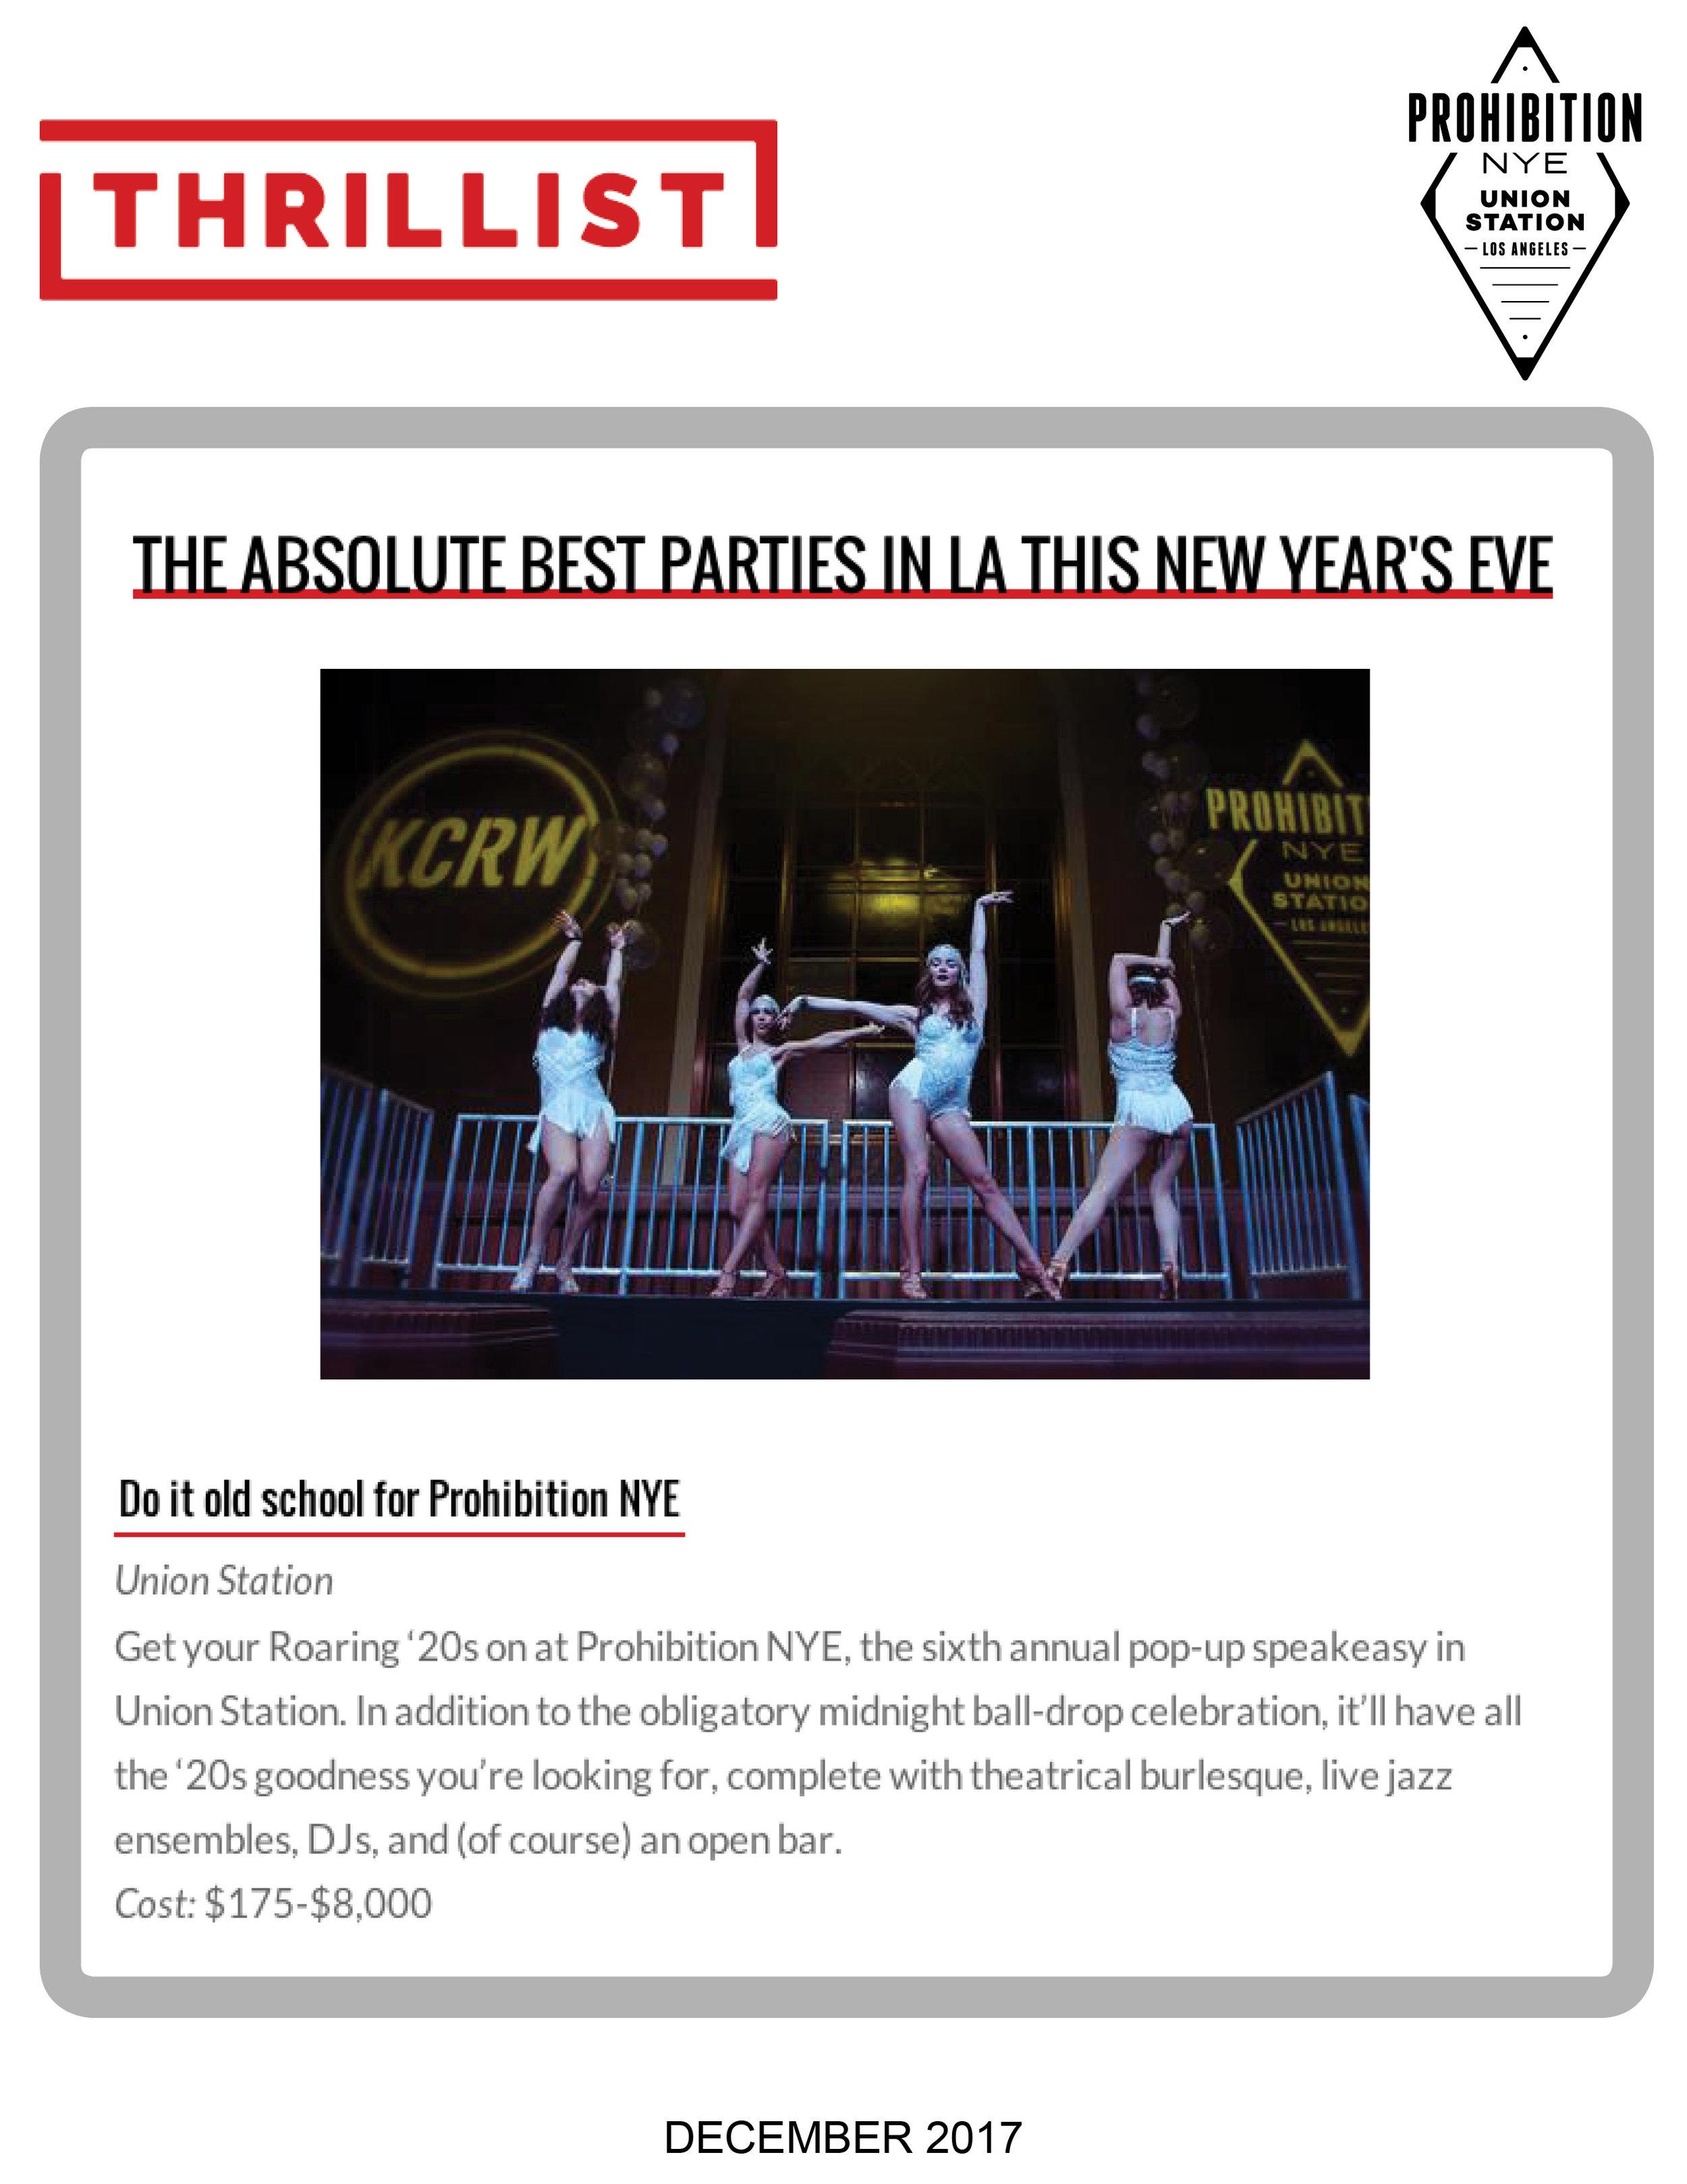 ProhibitionNYE_Thrillist_December2017.jpg